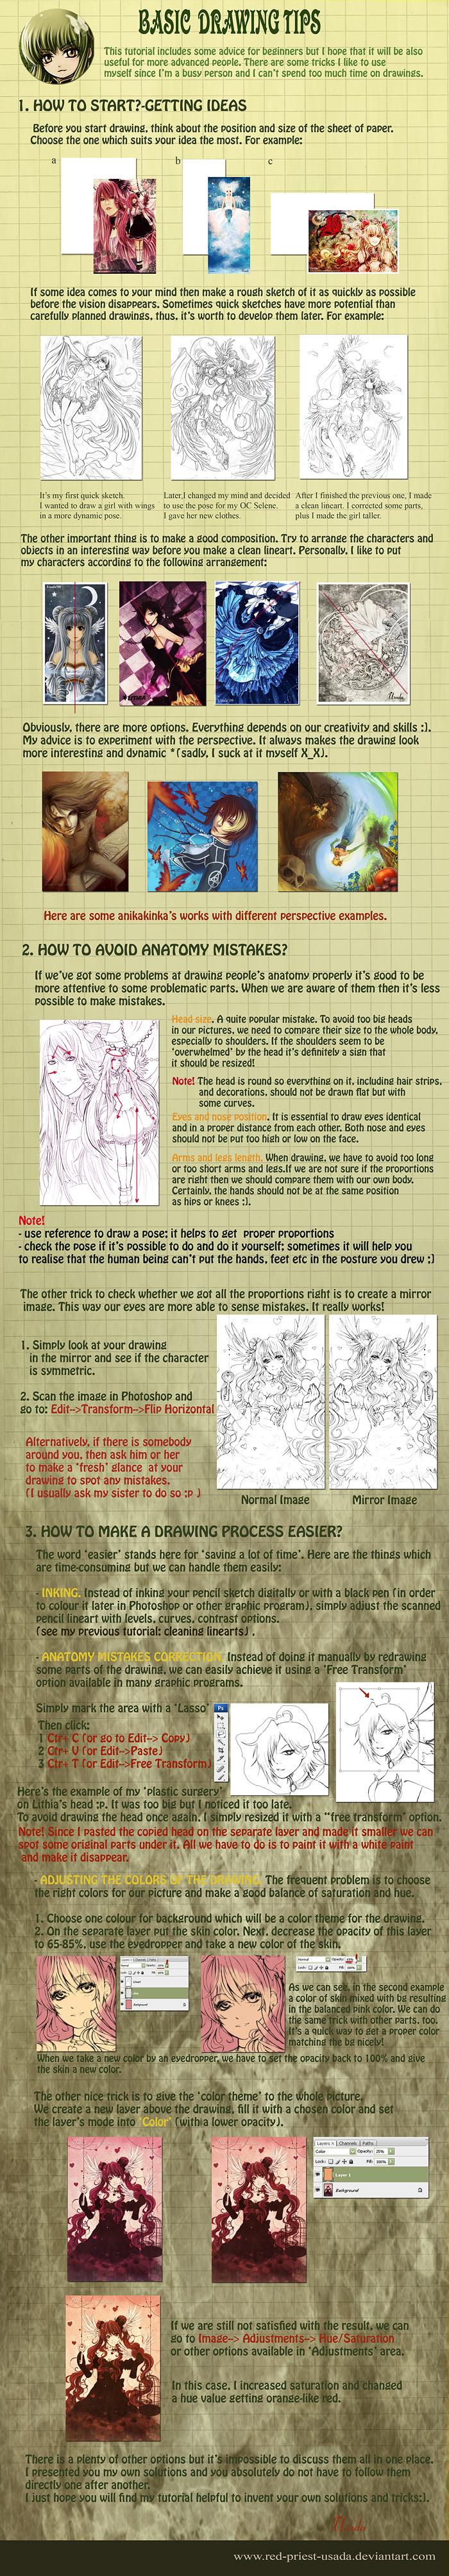 Tutorial: Basic drawing tips